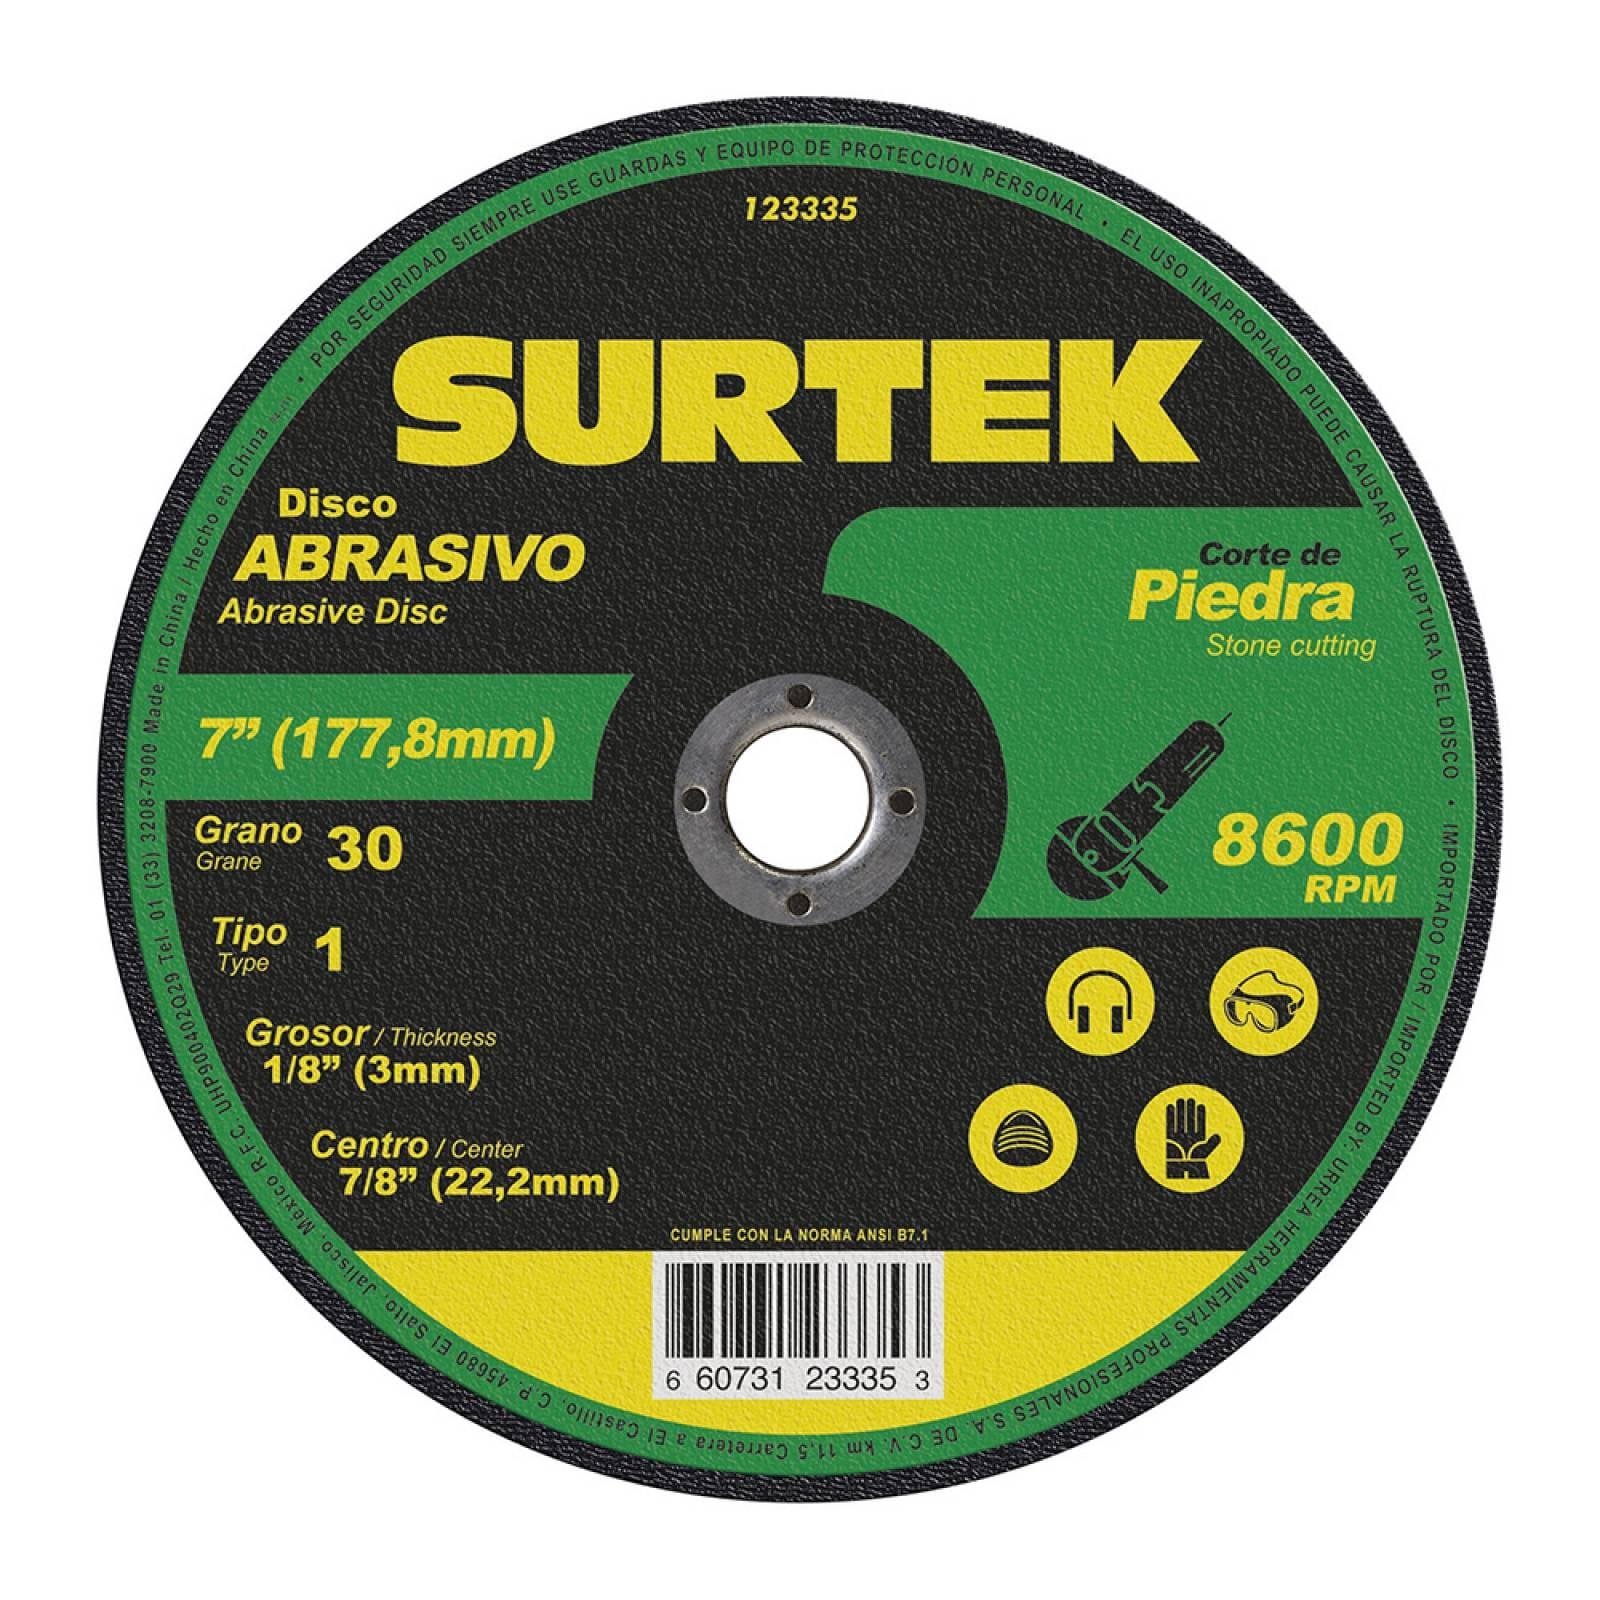 "Disco T/1 Piedra 7X9/64"" 123335 Surtek"